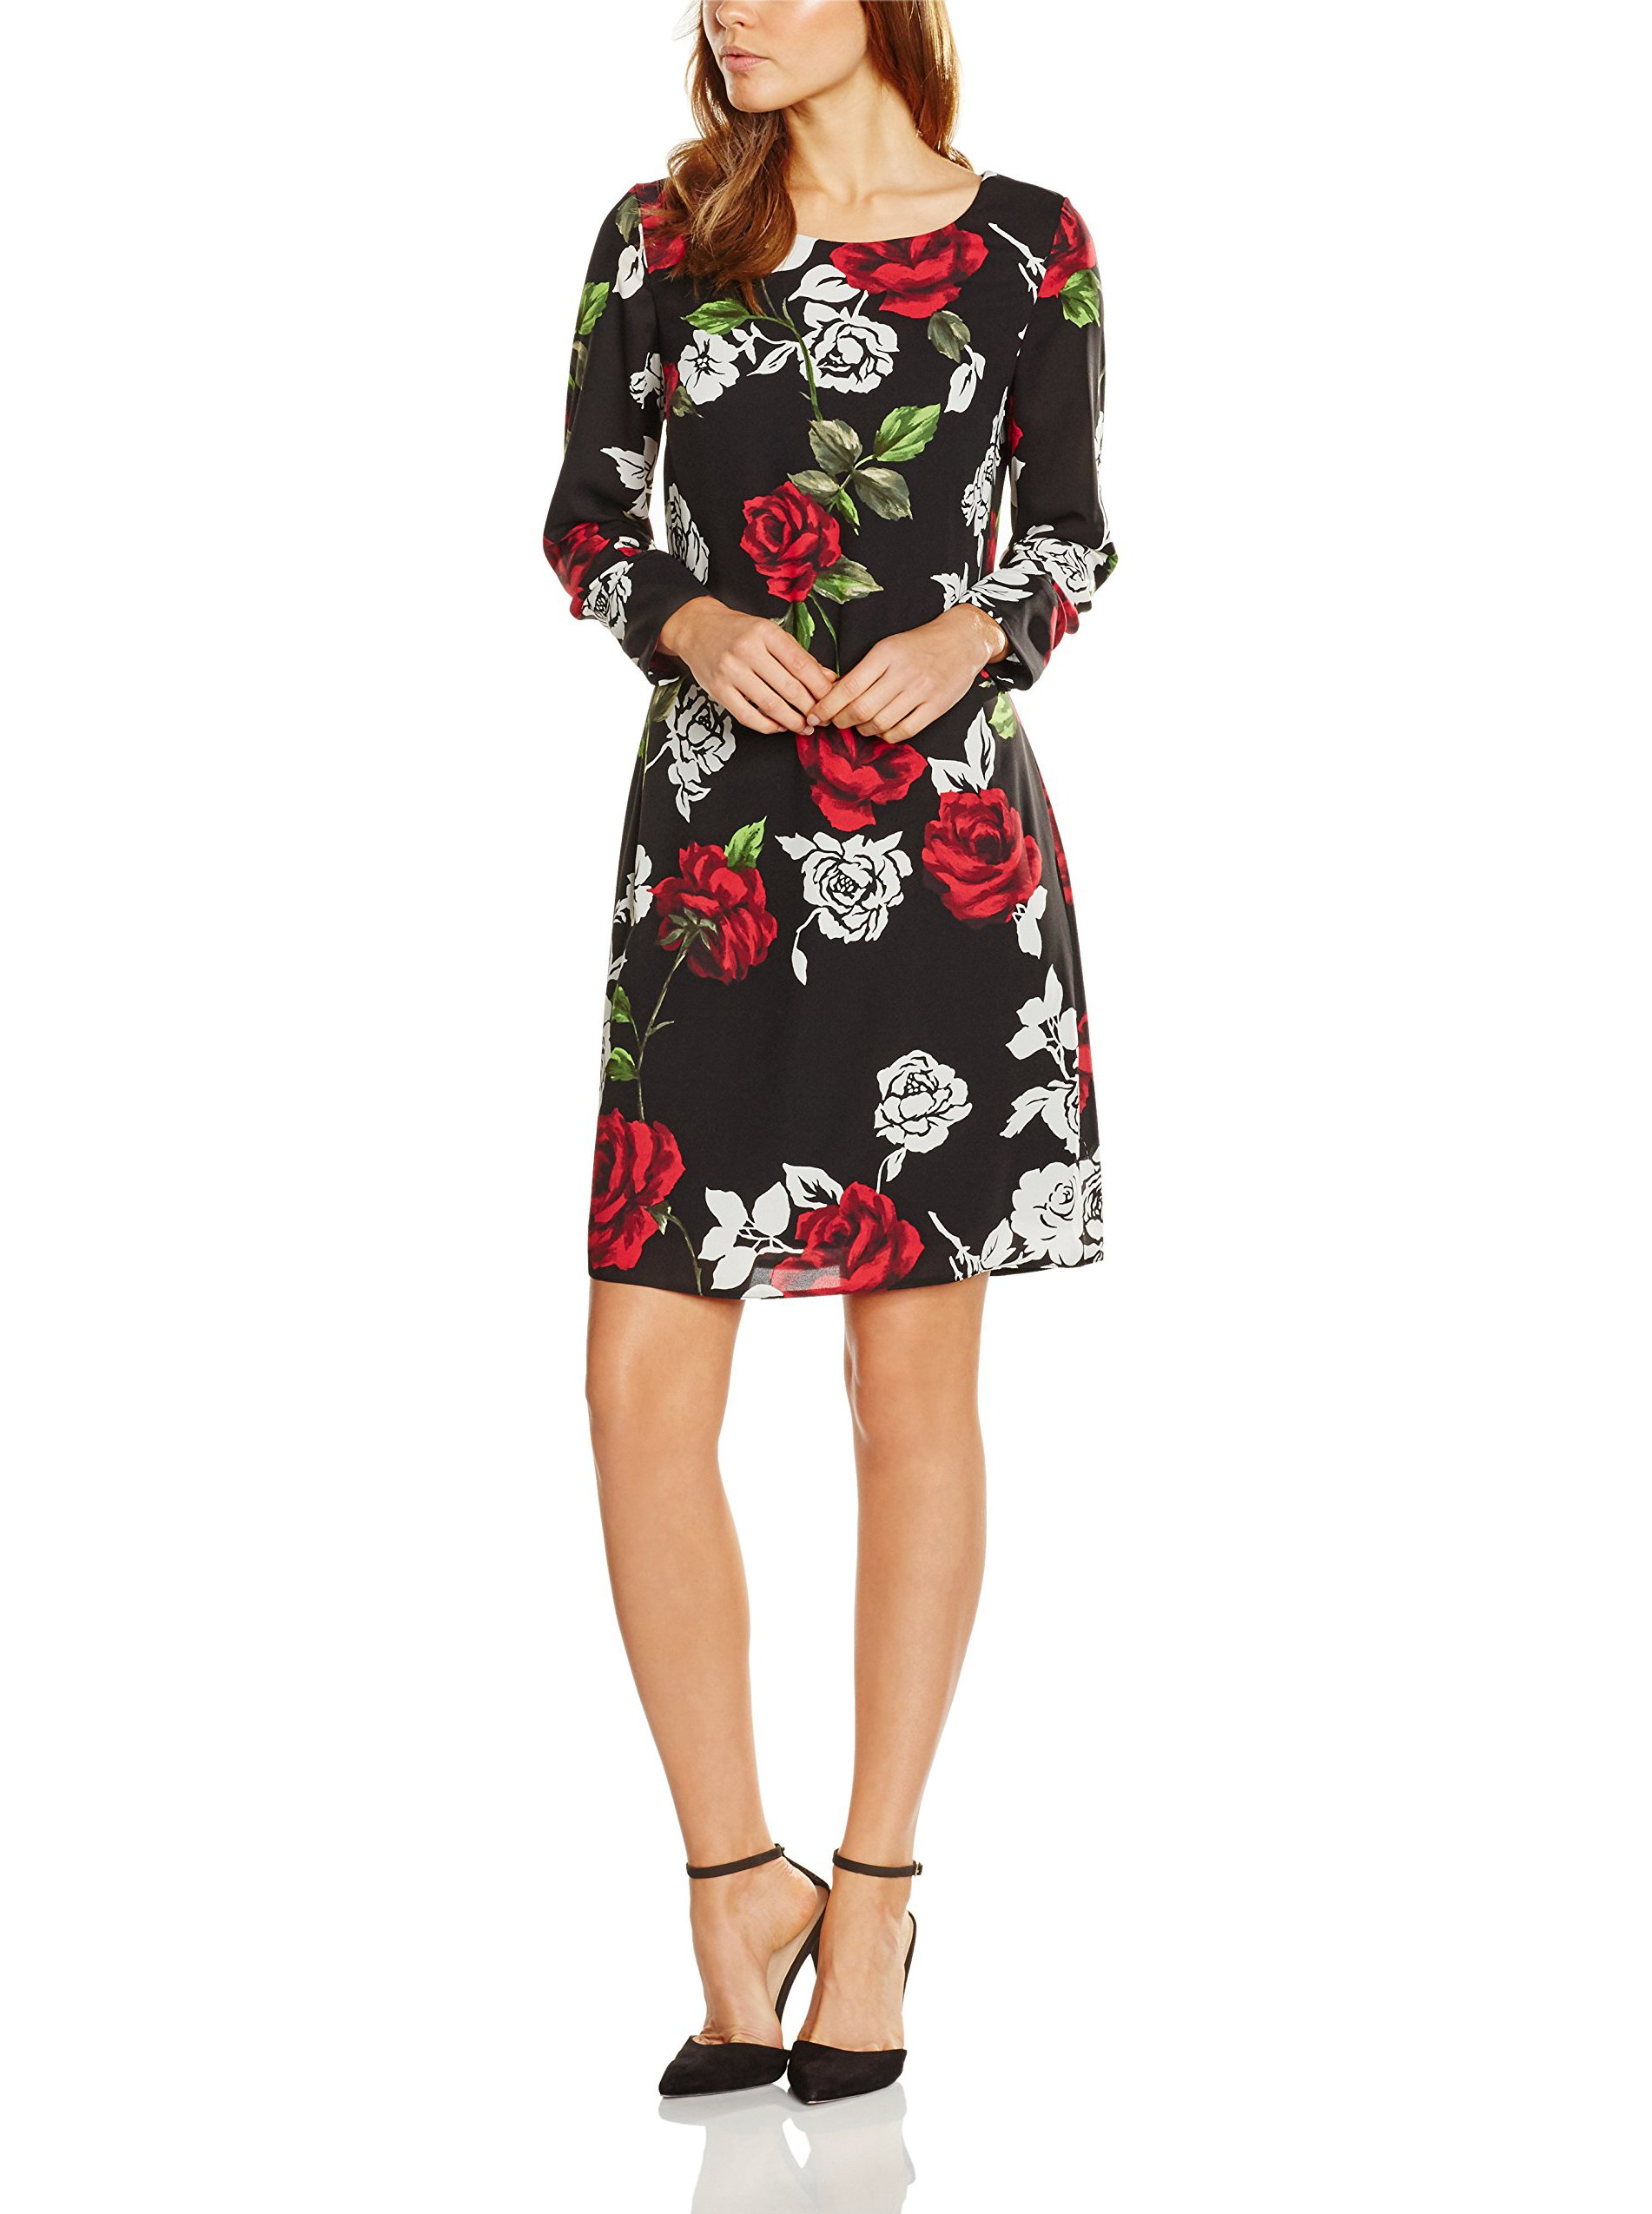 Rose Bacconi Femme BlackredBlack42taille Gina Trapèze Noir GeorgetteRobe Manches Longues Fabricant14 Modern 1JlcT3FuK